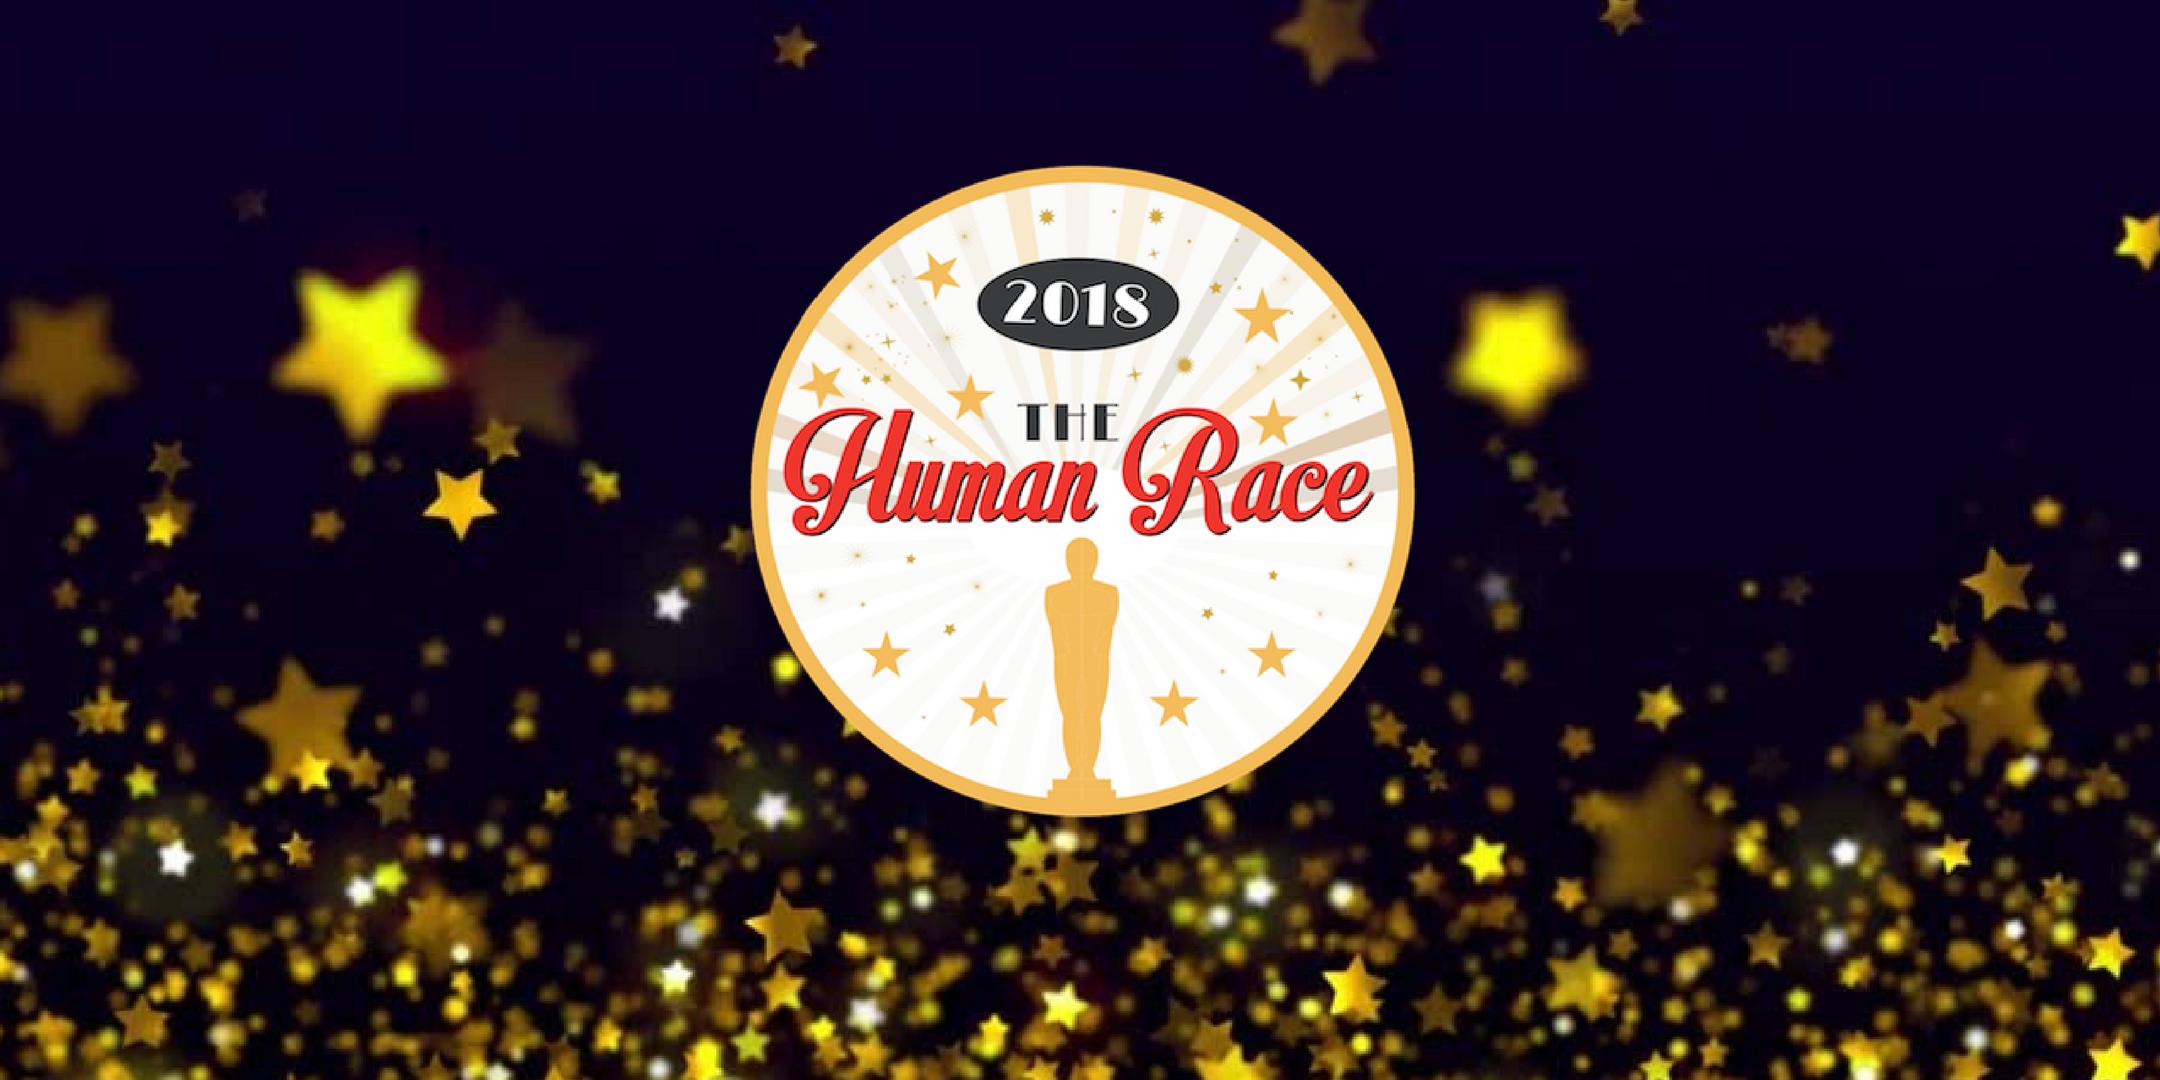 The Human Race 2018